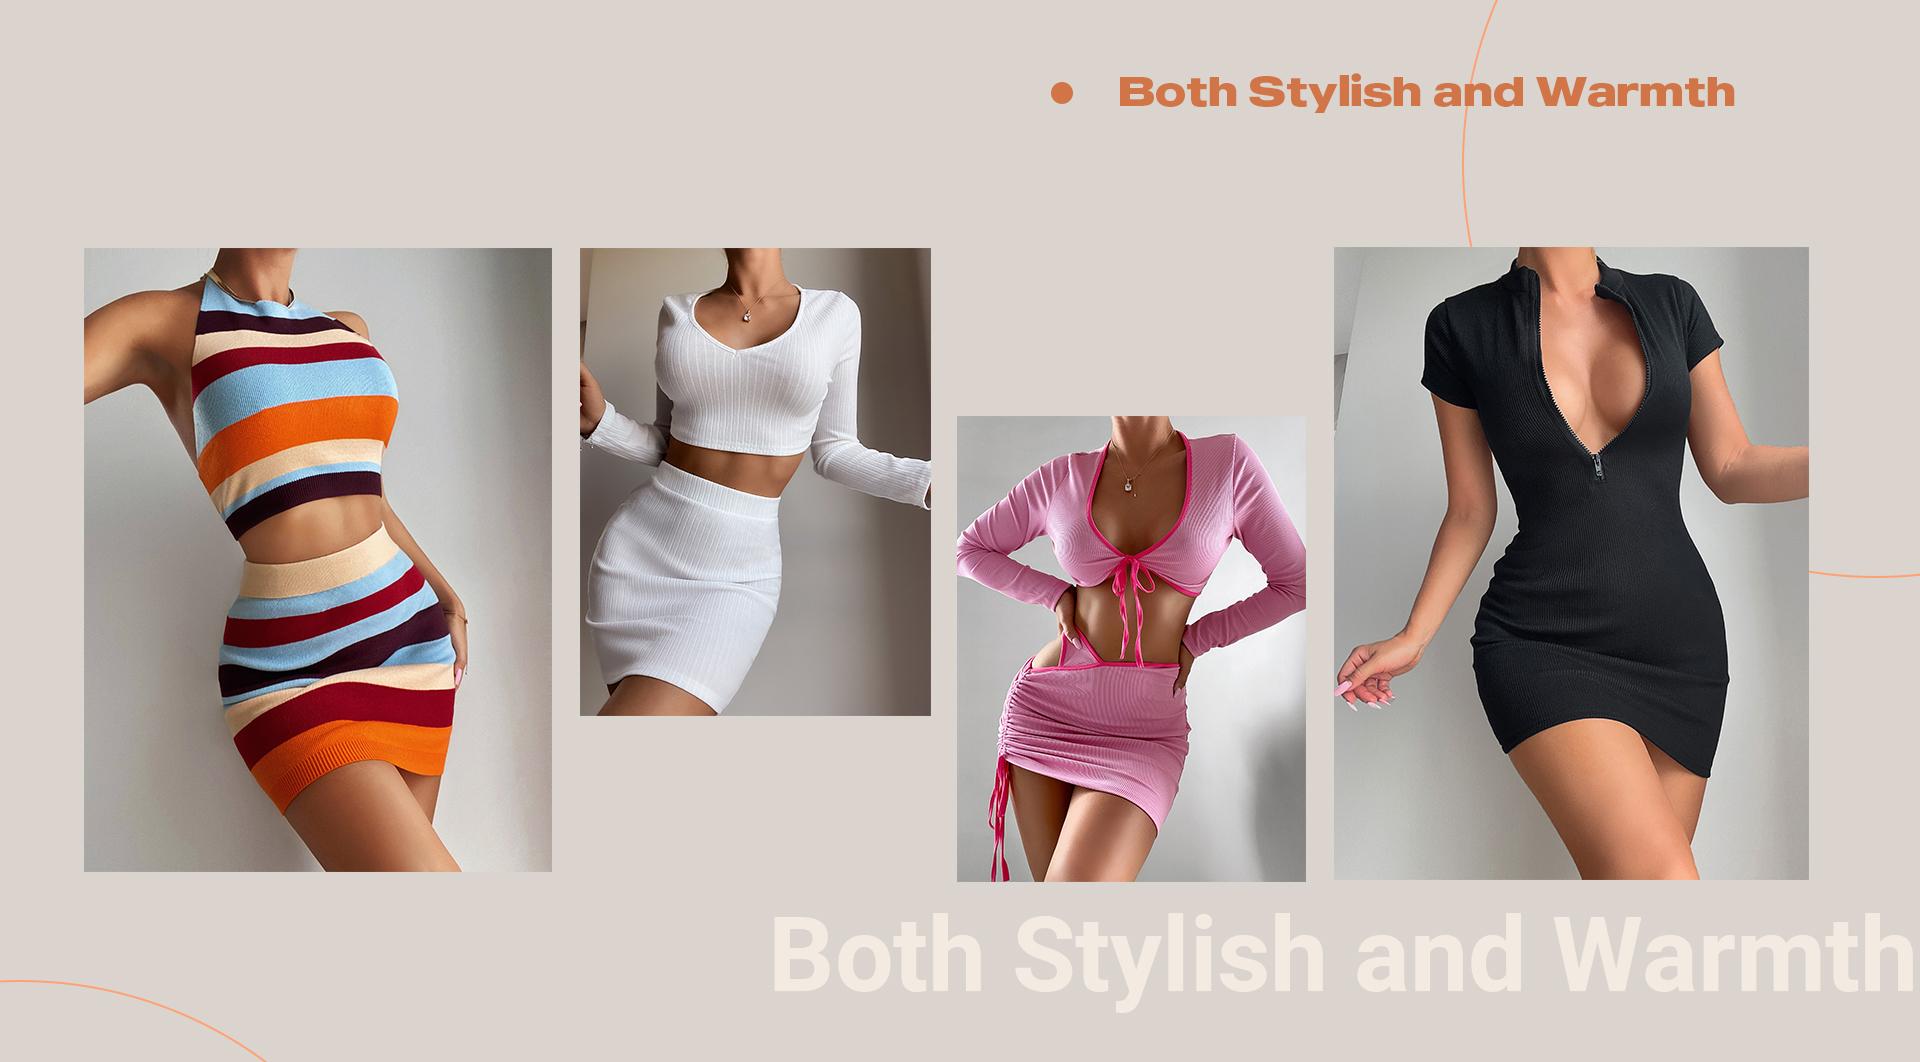 Both stylish and warmth